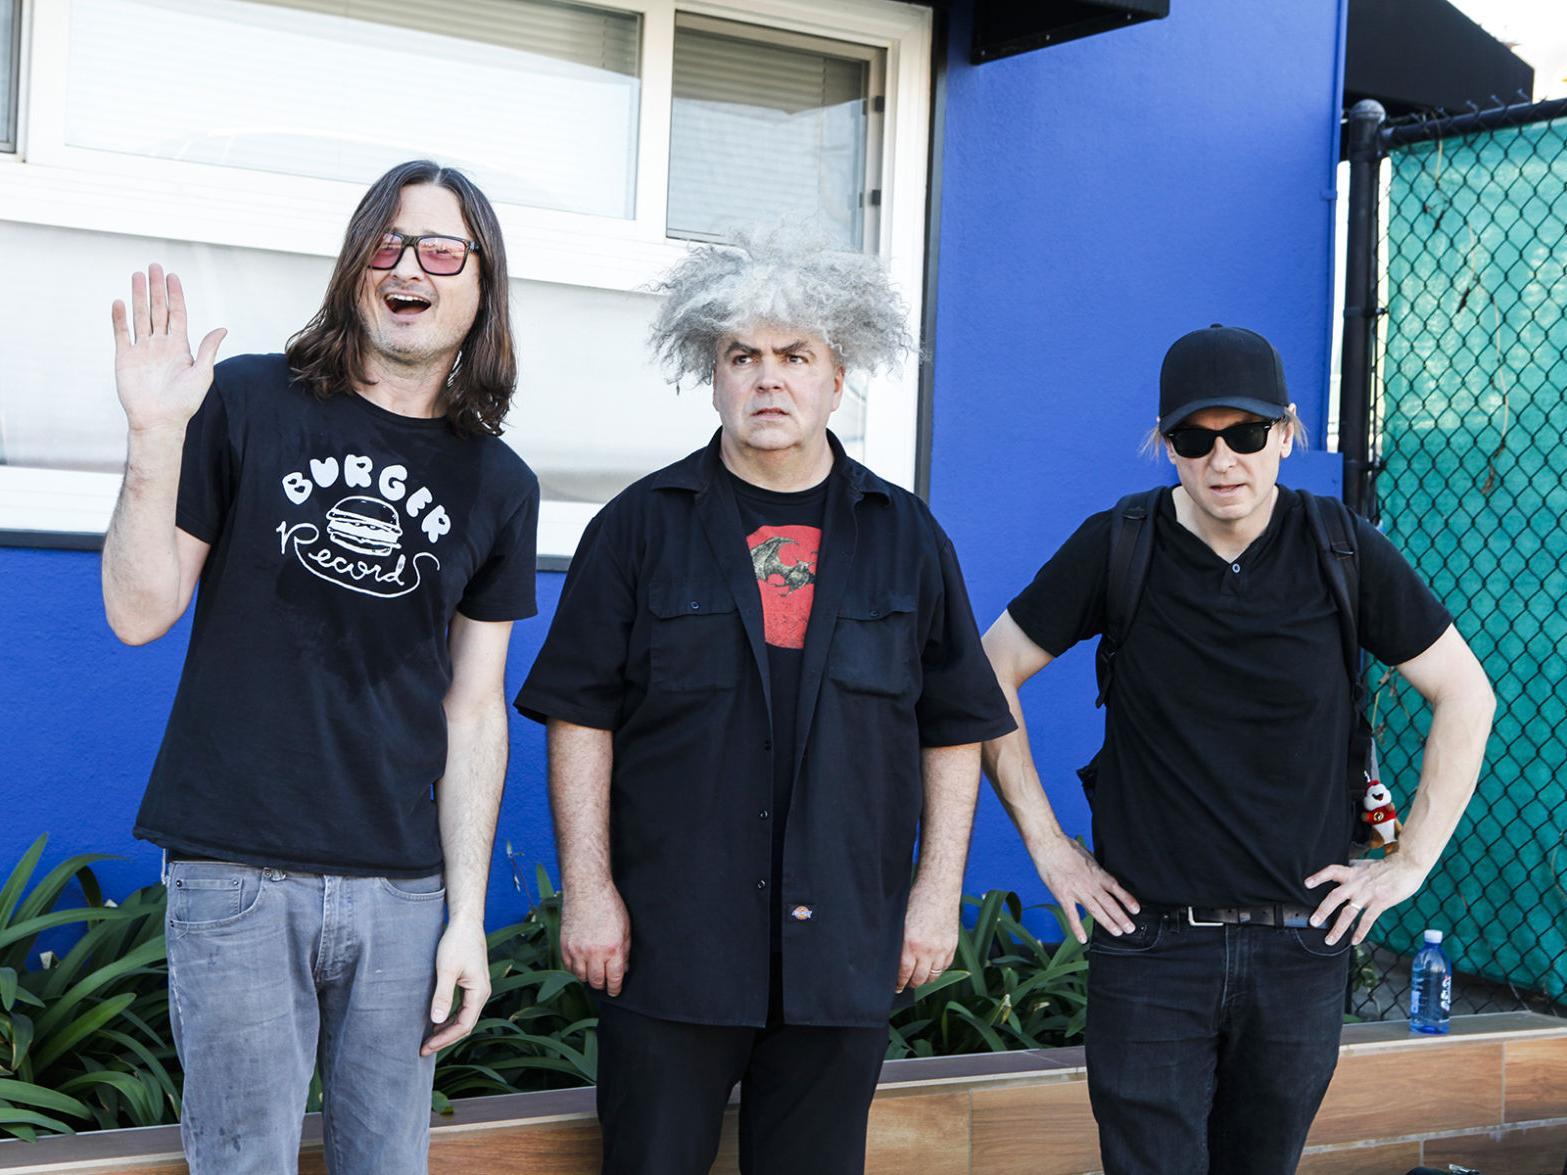 Melvins ปล่อยซิงเกิ้ลใหม่ The Great Good Place จากอัลบั้มใหม่ Working With God 1